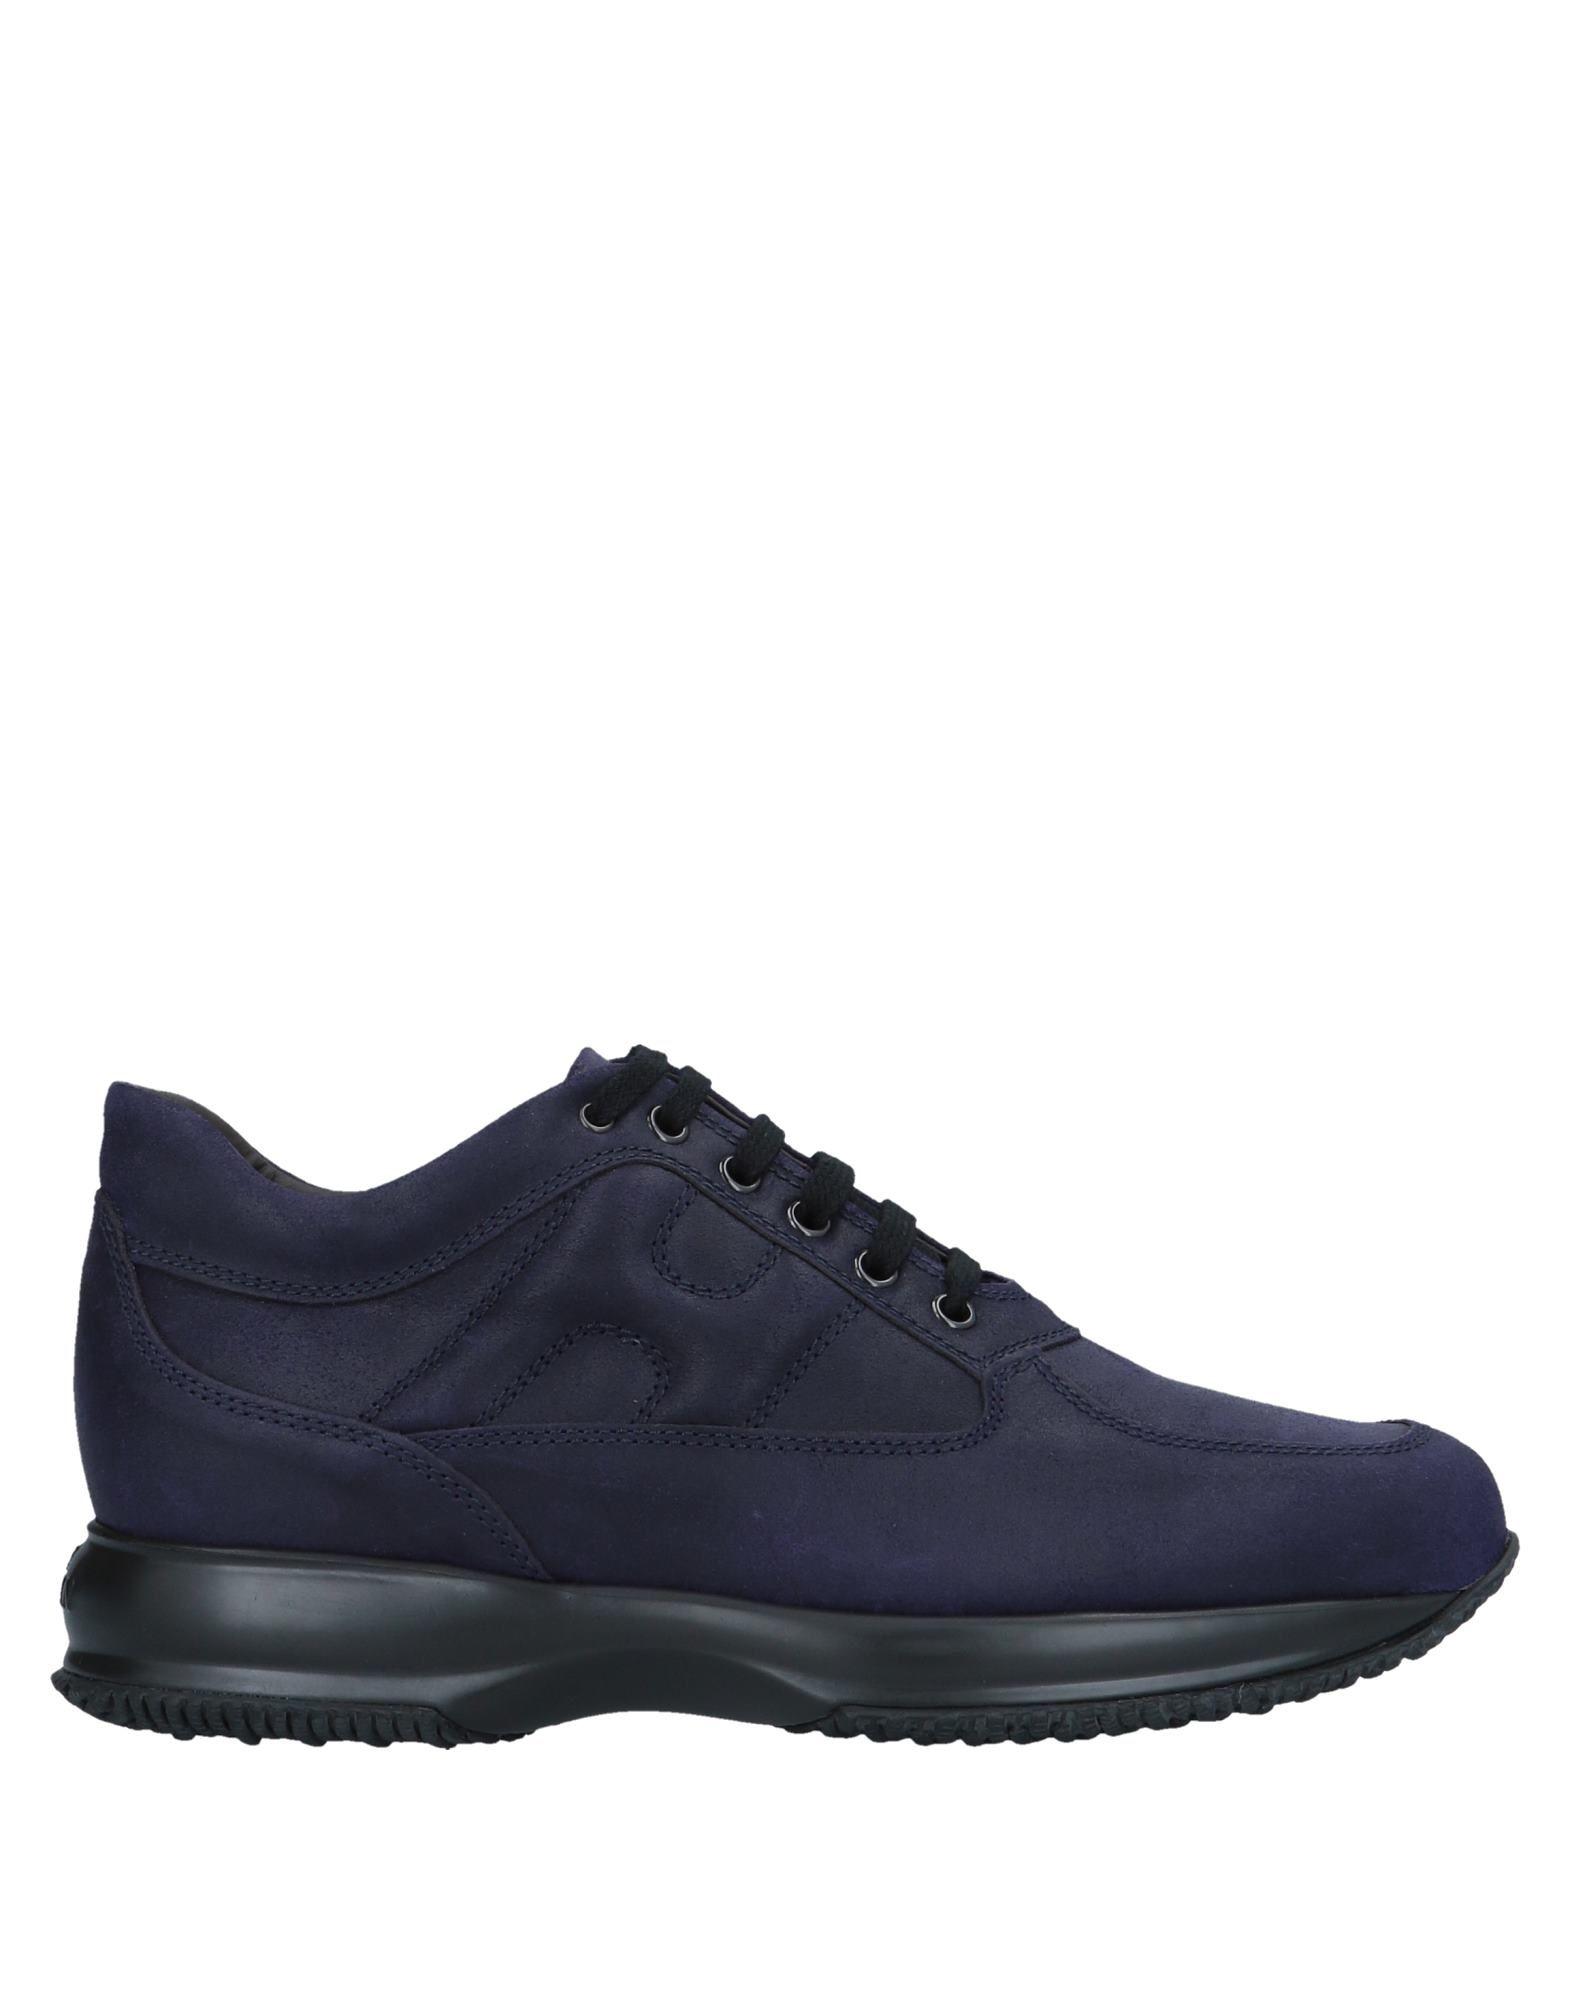 Hogan Sneakers Herren  11544042ET Gute Qualität beliebte Schuhe